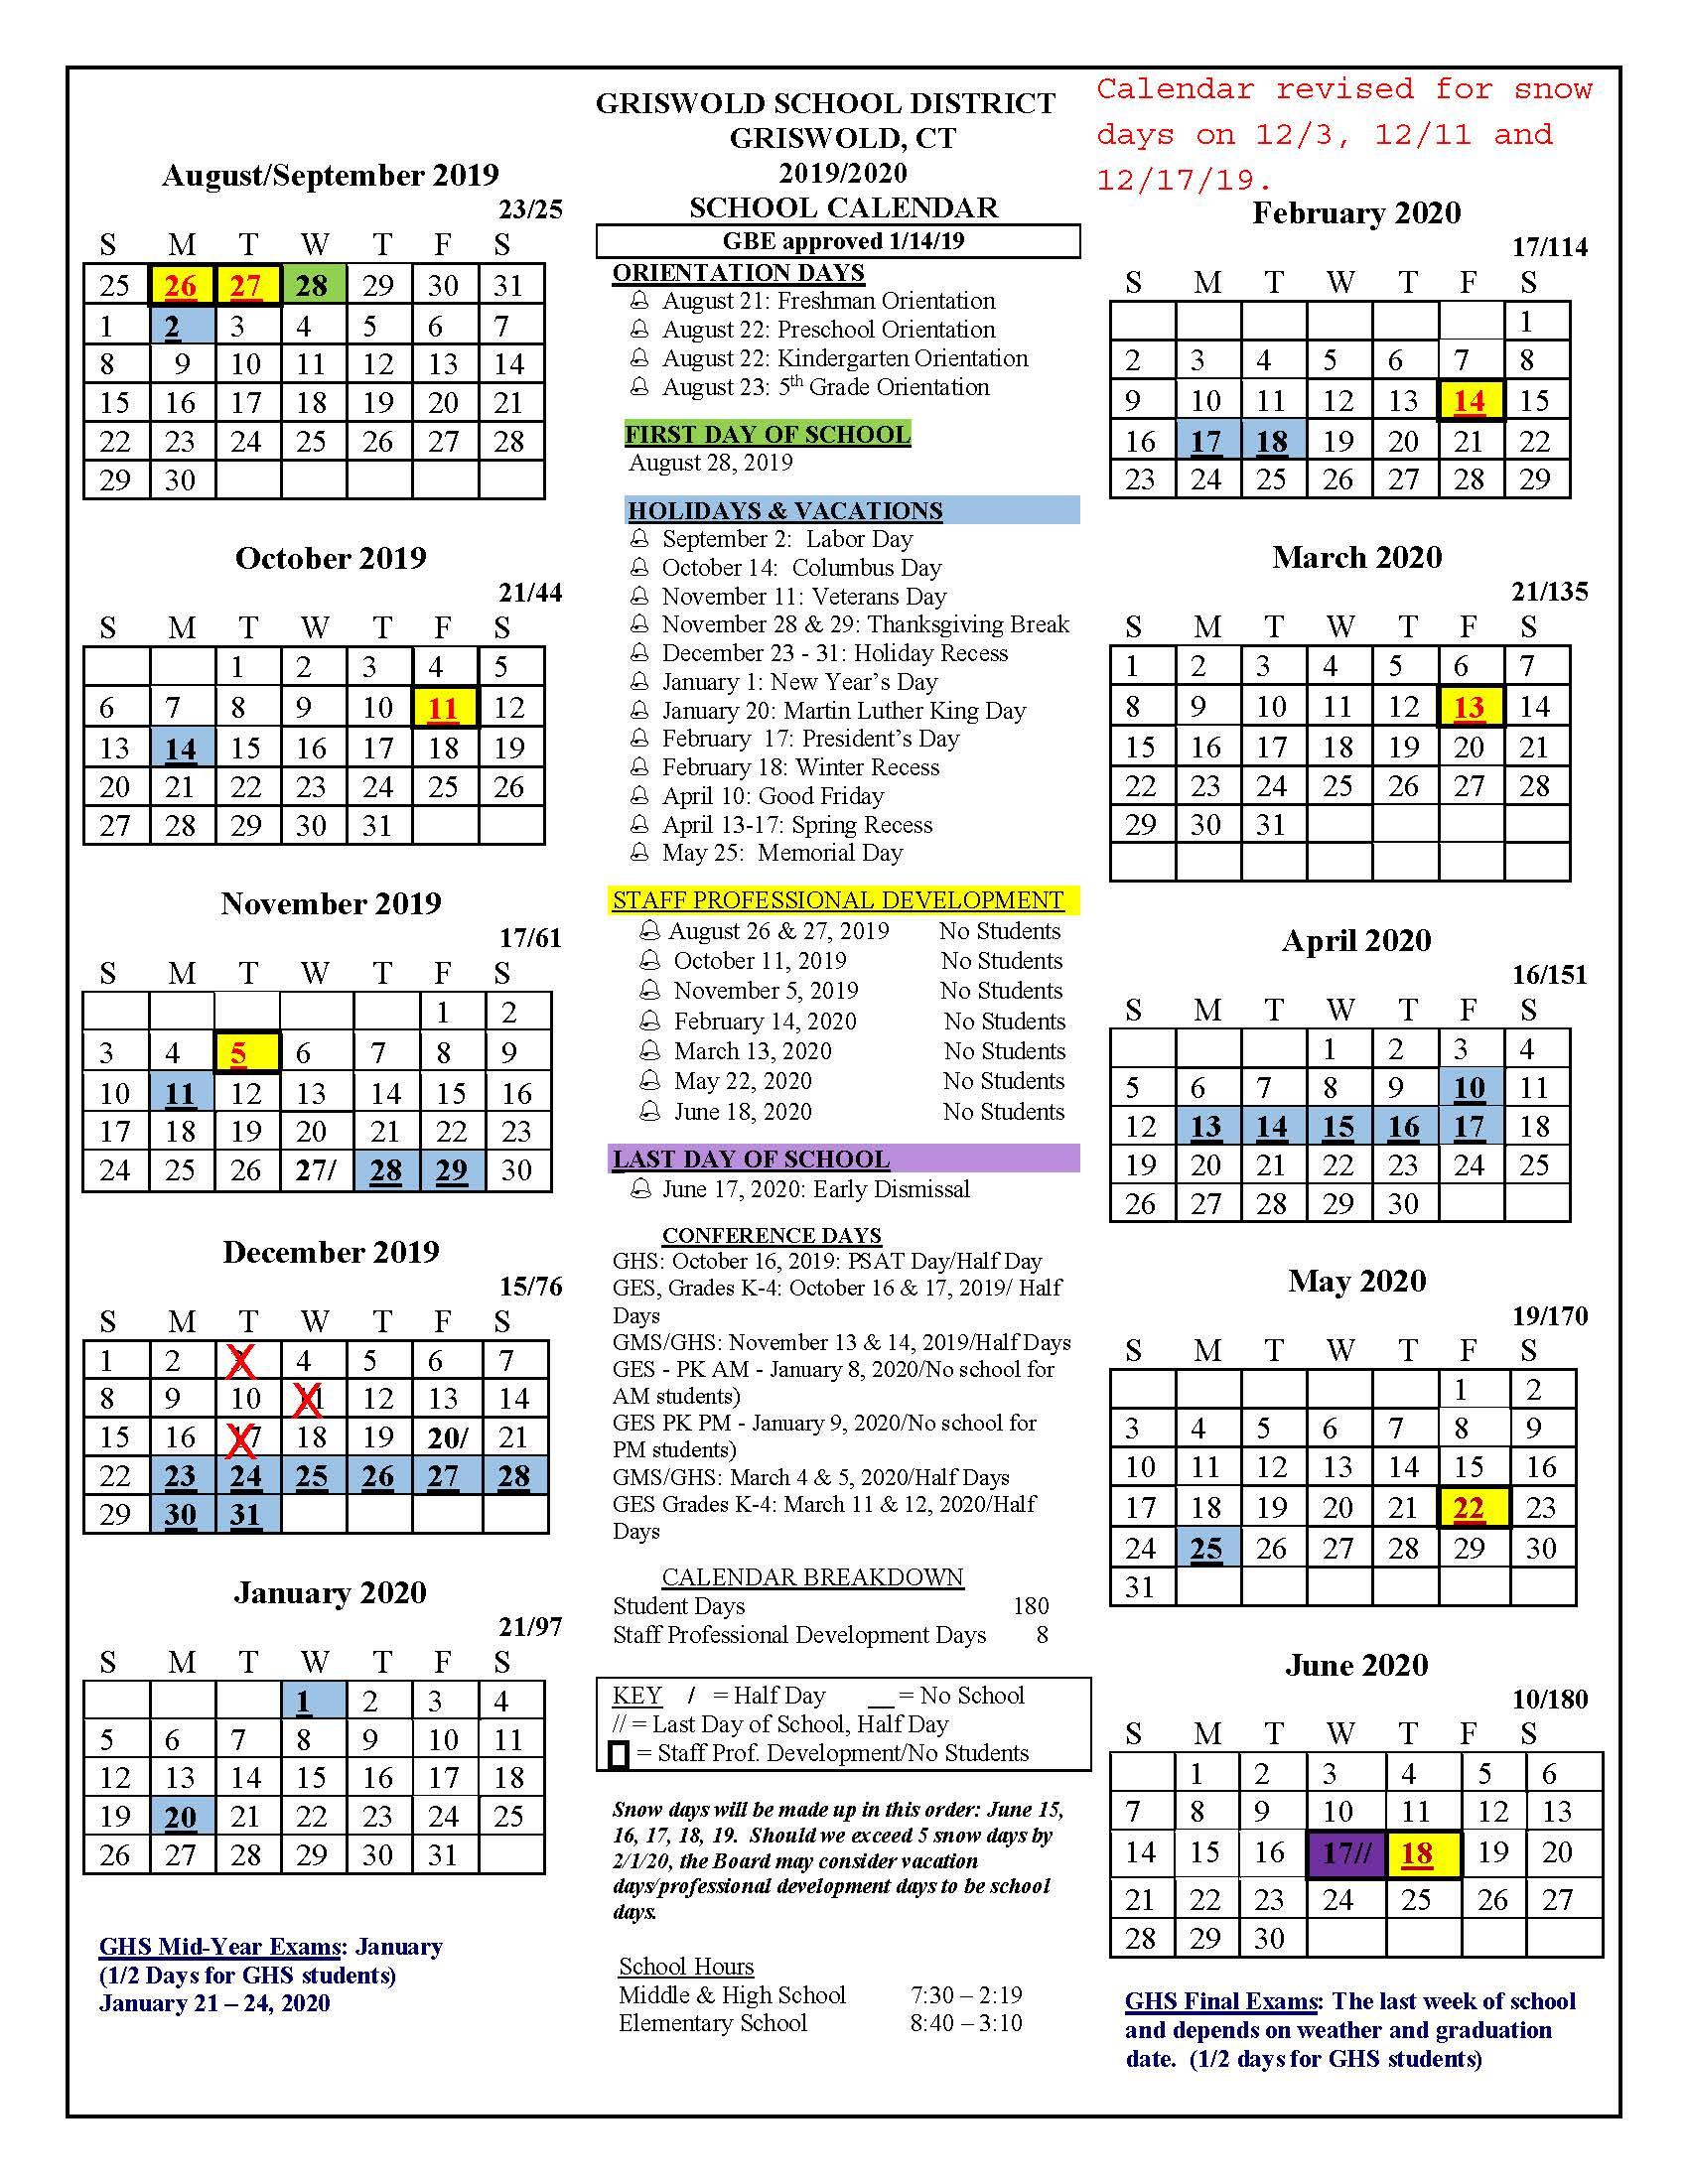 Board Approved Academic Calendar - Griswold Public Schools Inside Univ Of Rhode Island School Calendar